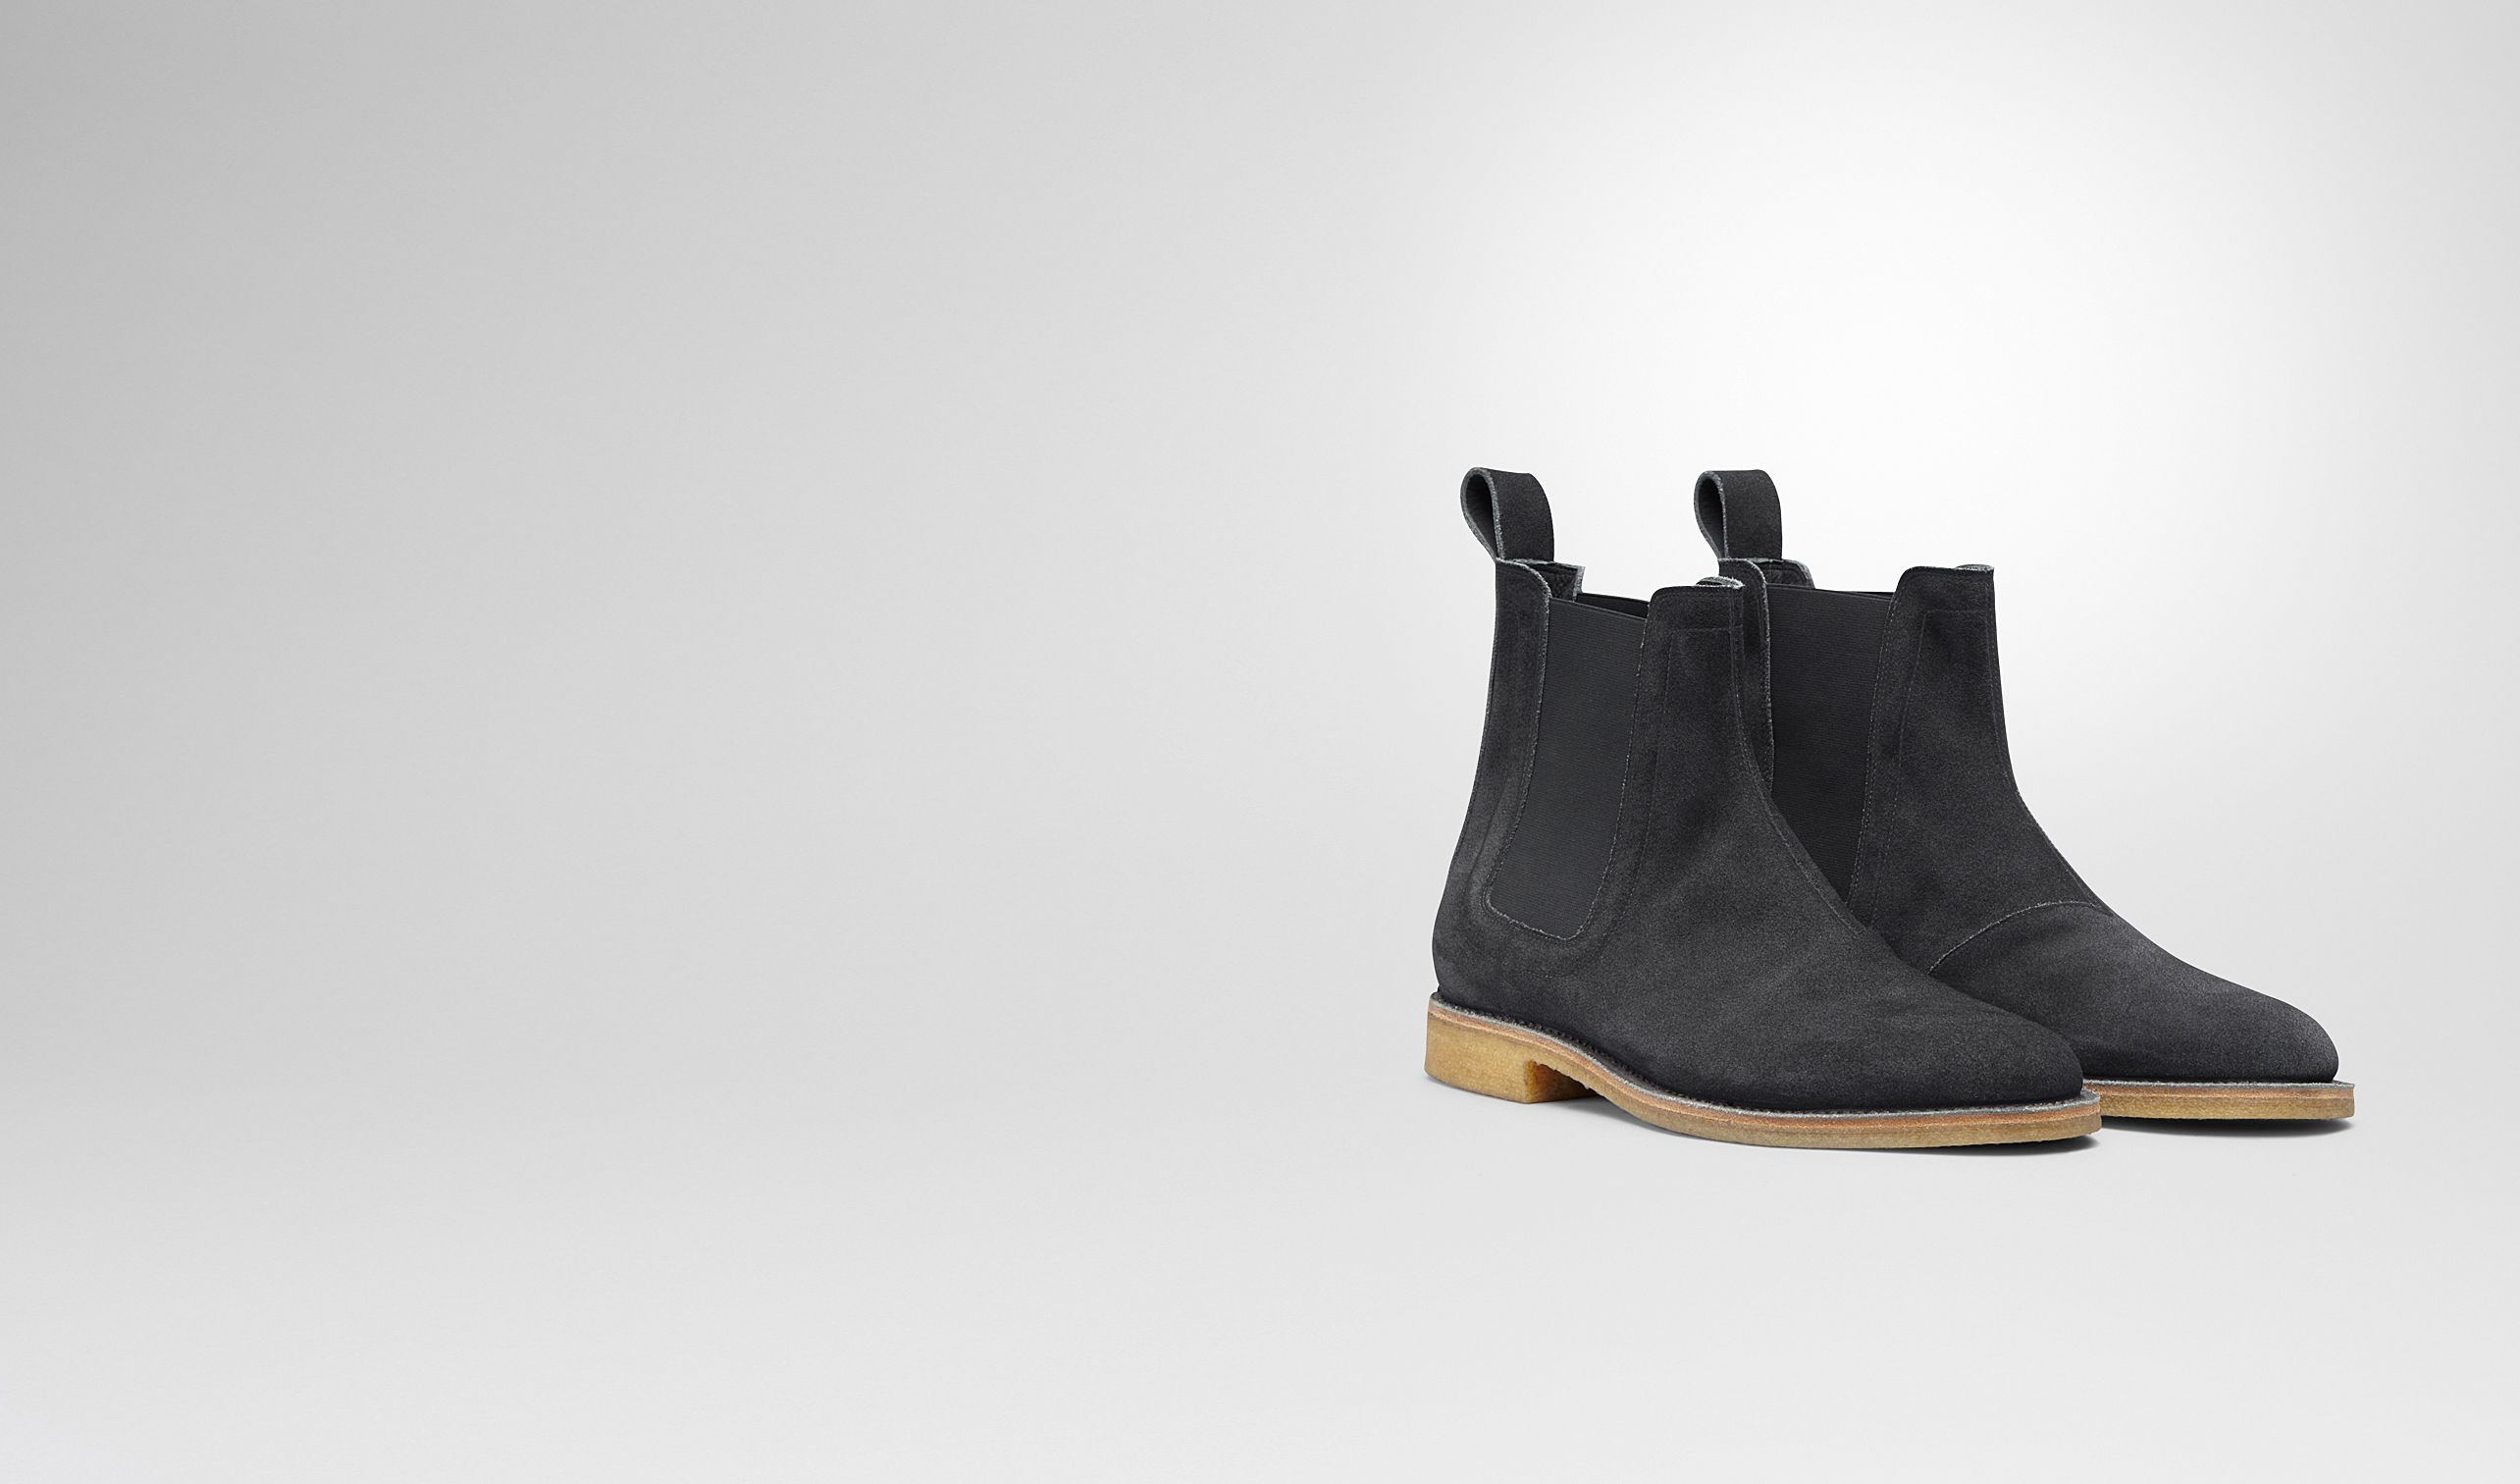 ARDOISE SUEDE DESERT BOOT - Men's Bottega Veneta® Boots And Ankle Boots -  Shop at